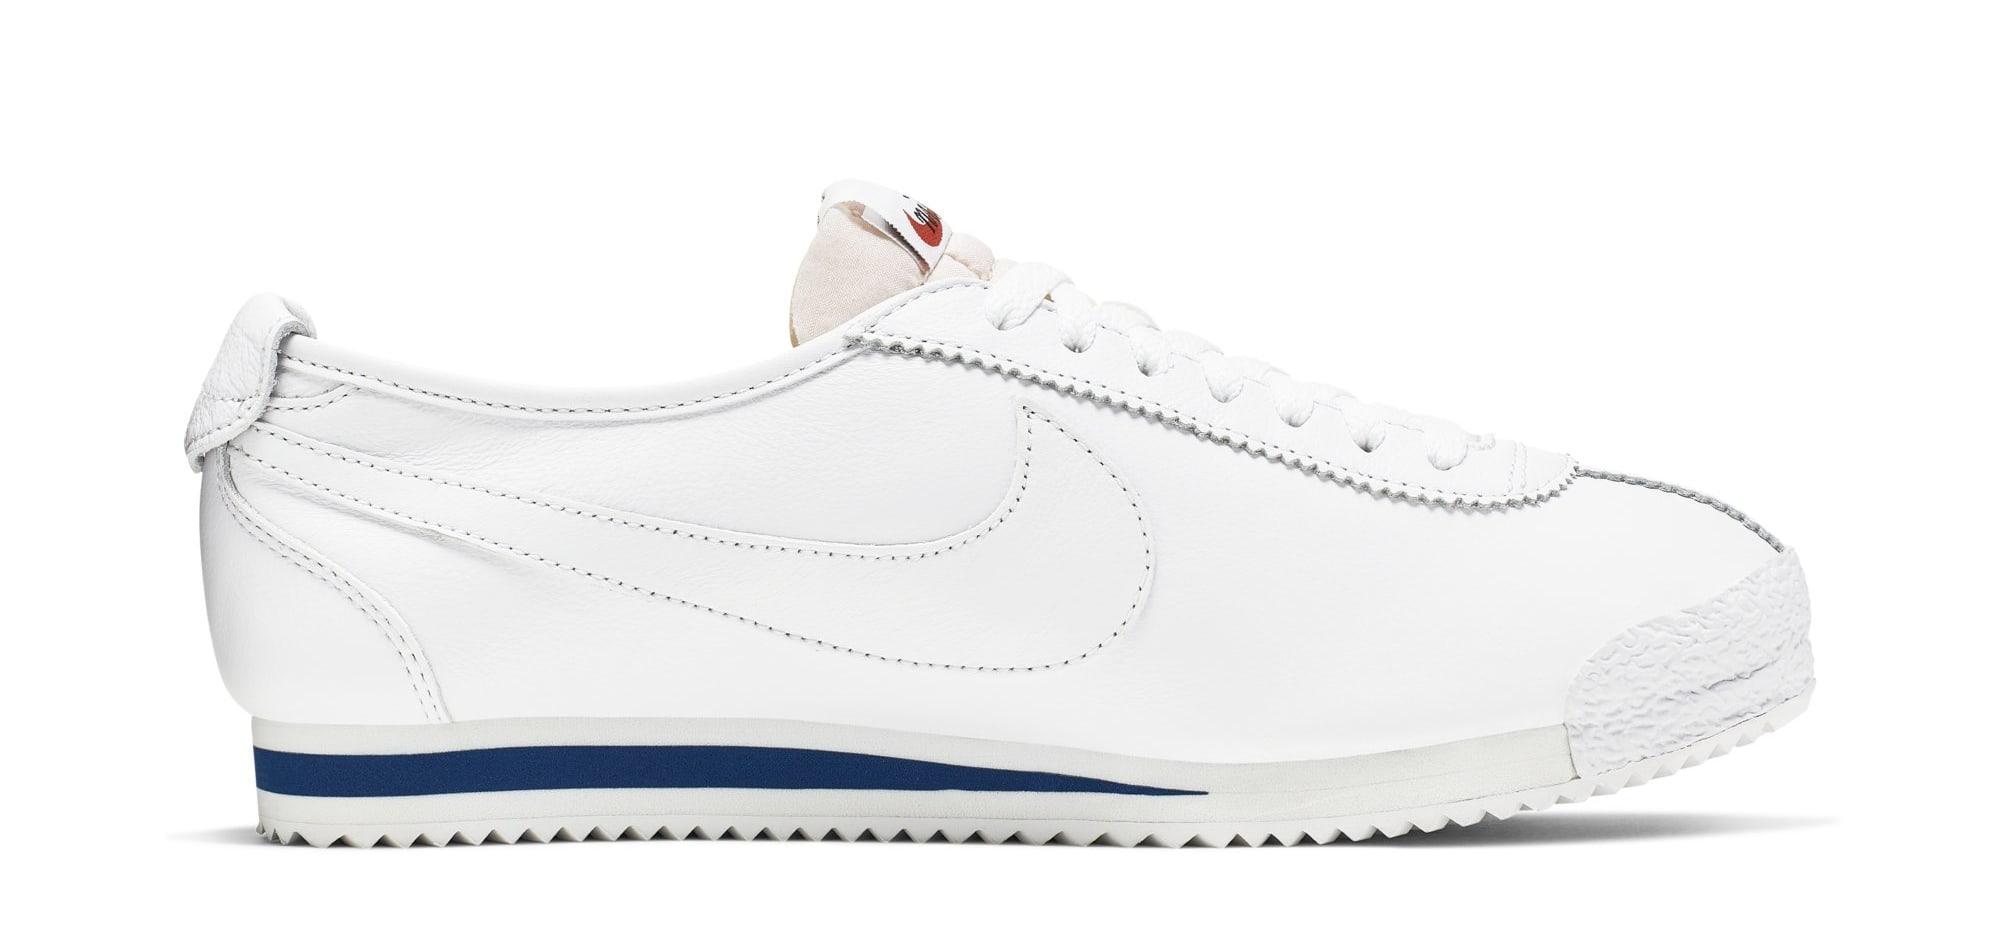 Nike Classic Cortez 'Shoe Dog Pack (Falcon)' CJ2586-101 (Medial)